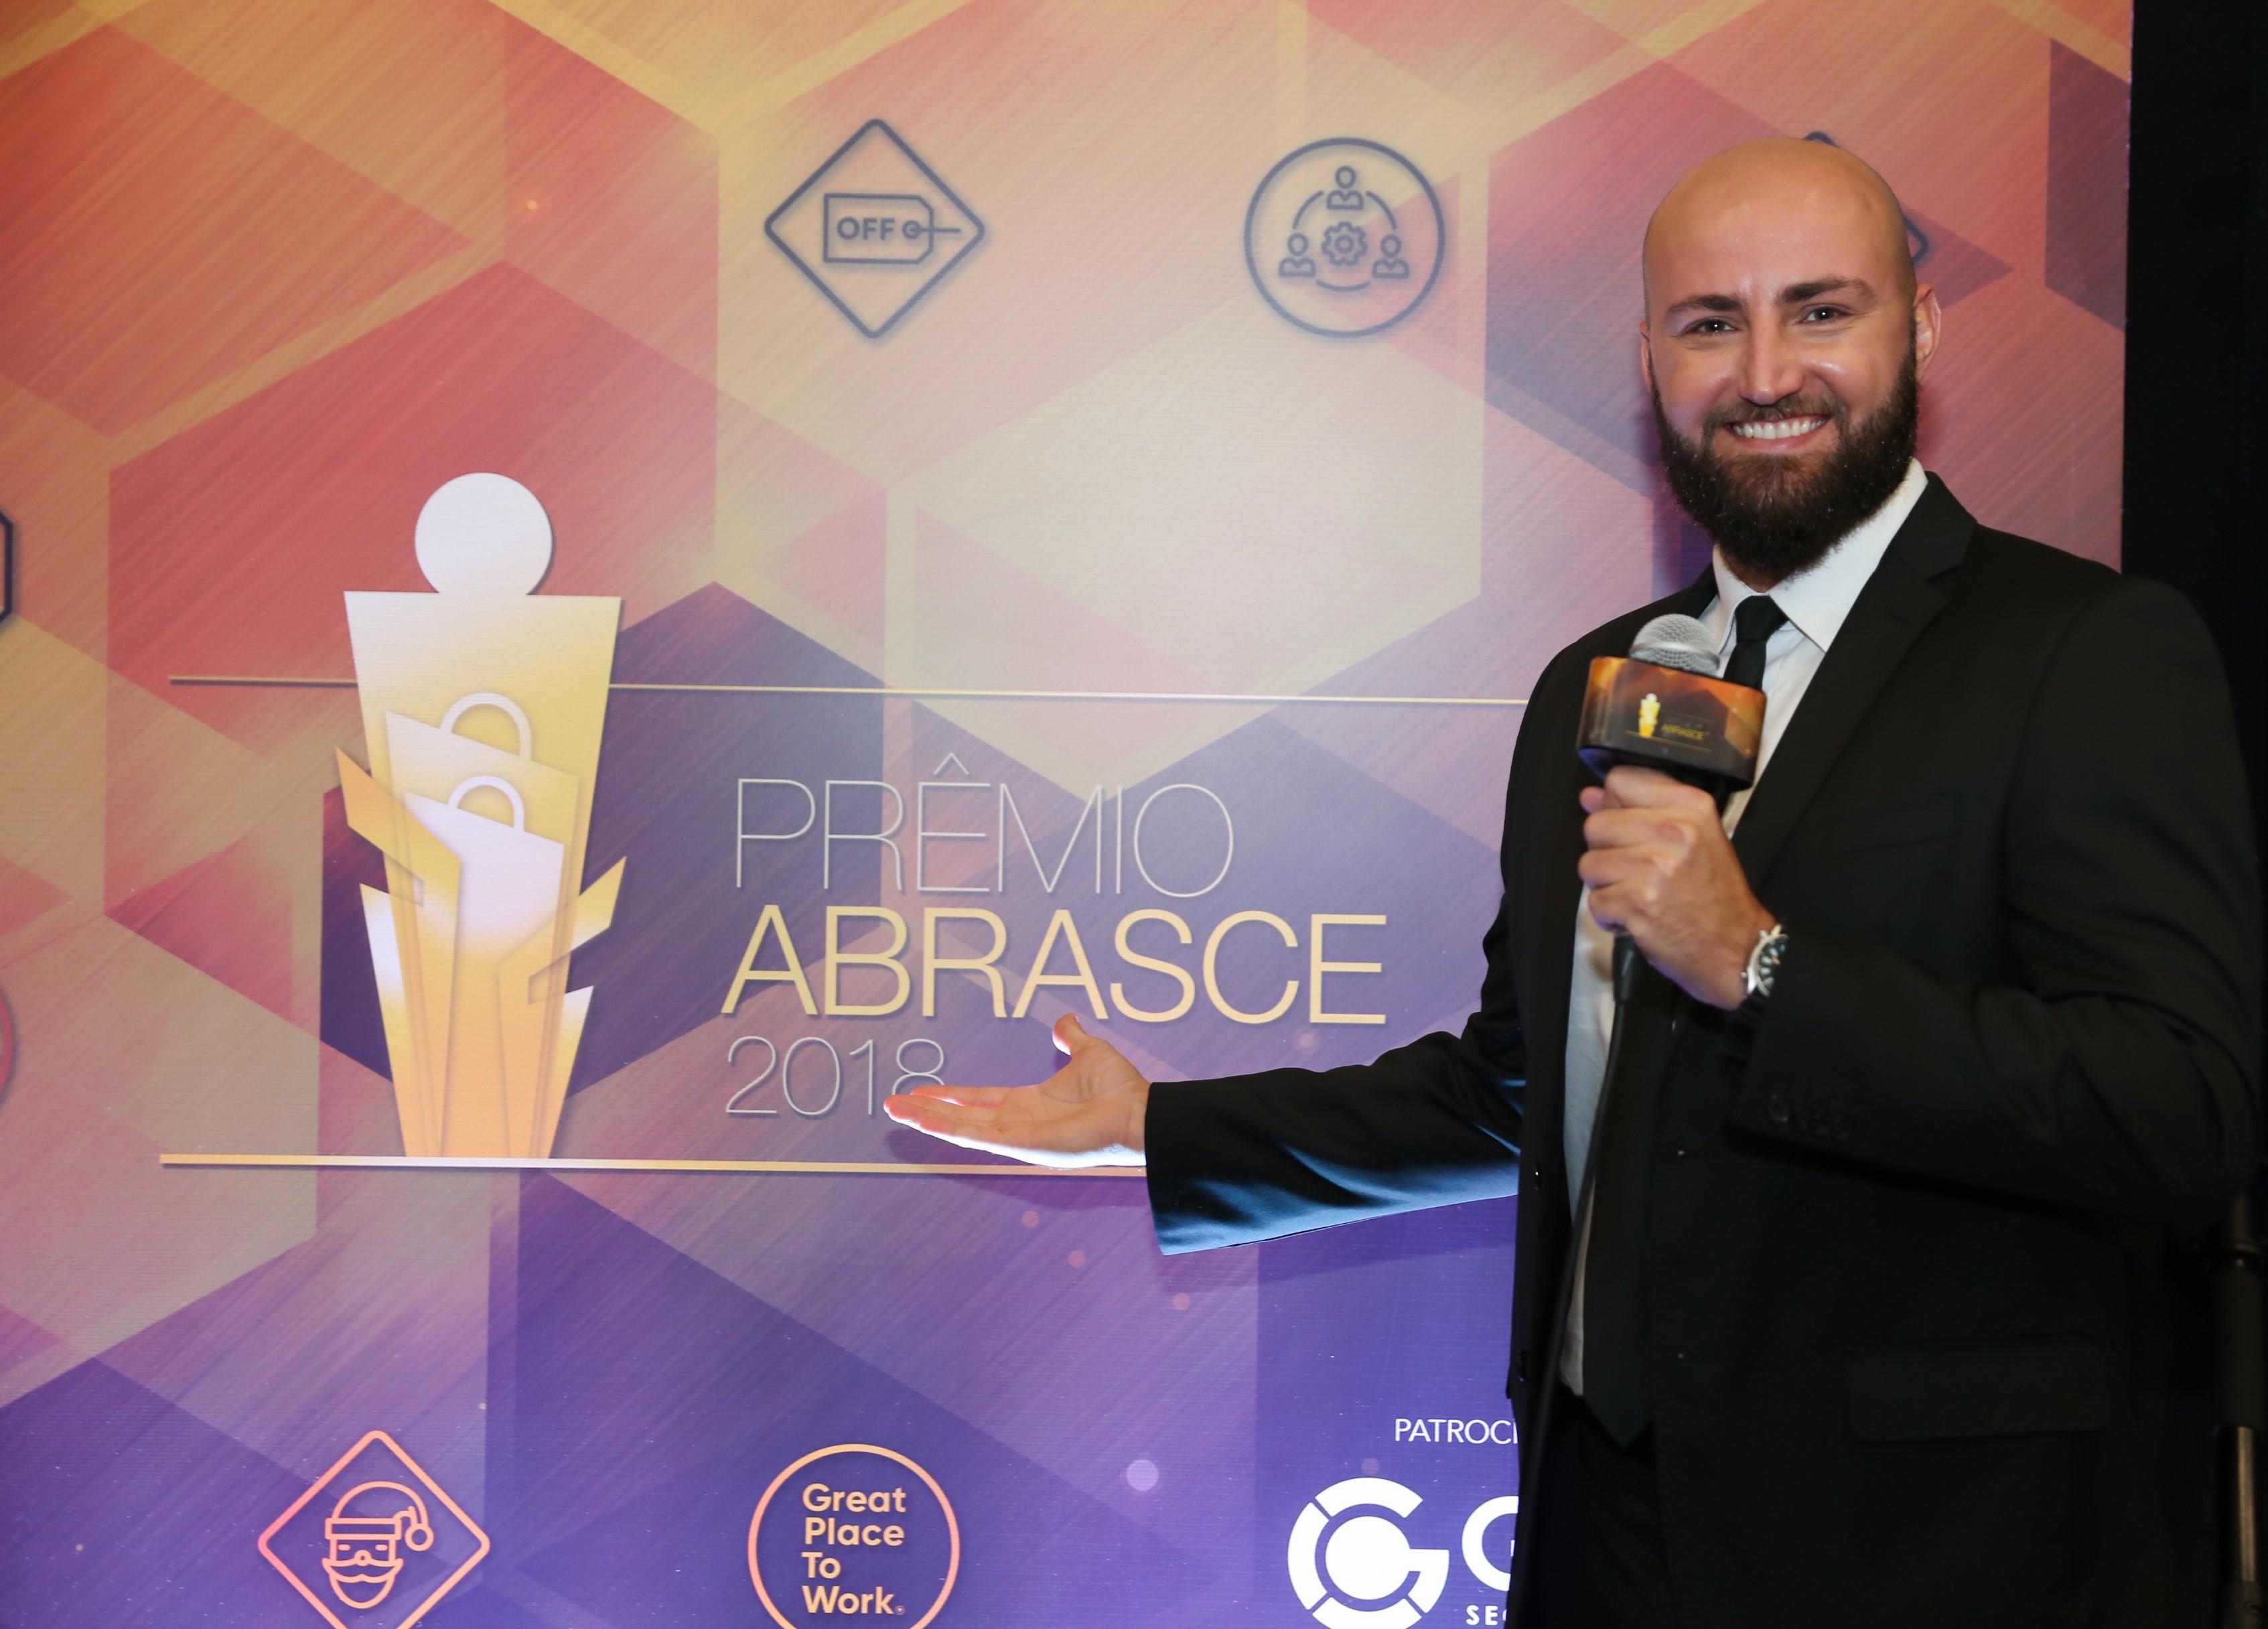 Jornalistas Prêmio Abrasce